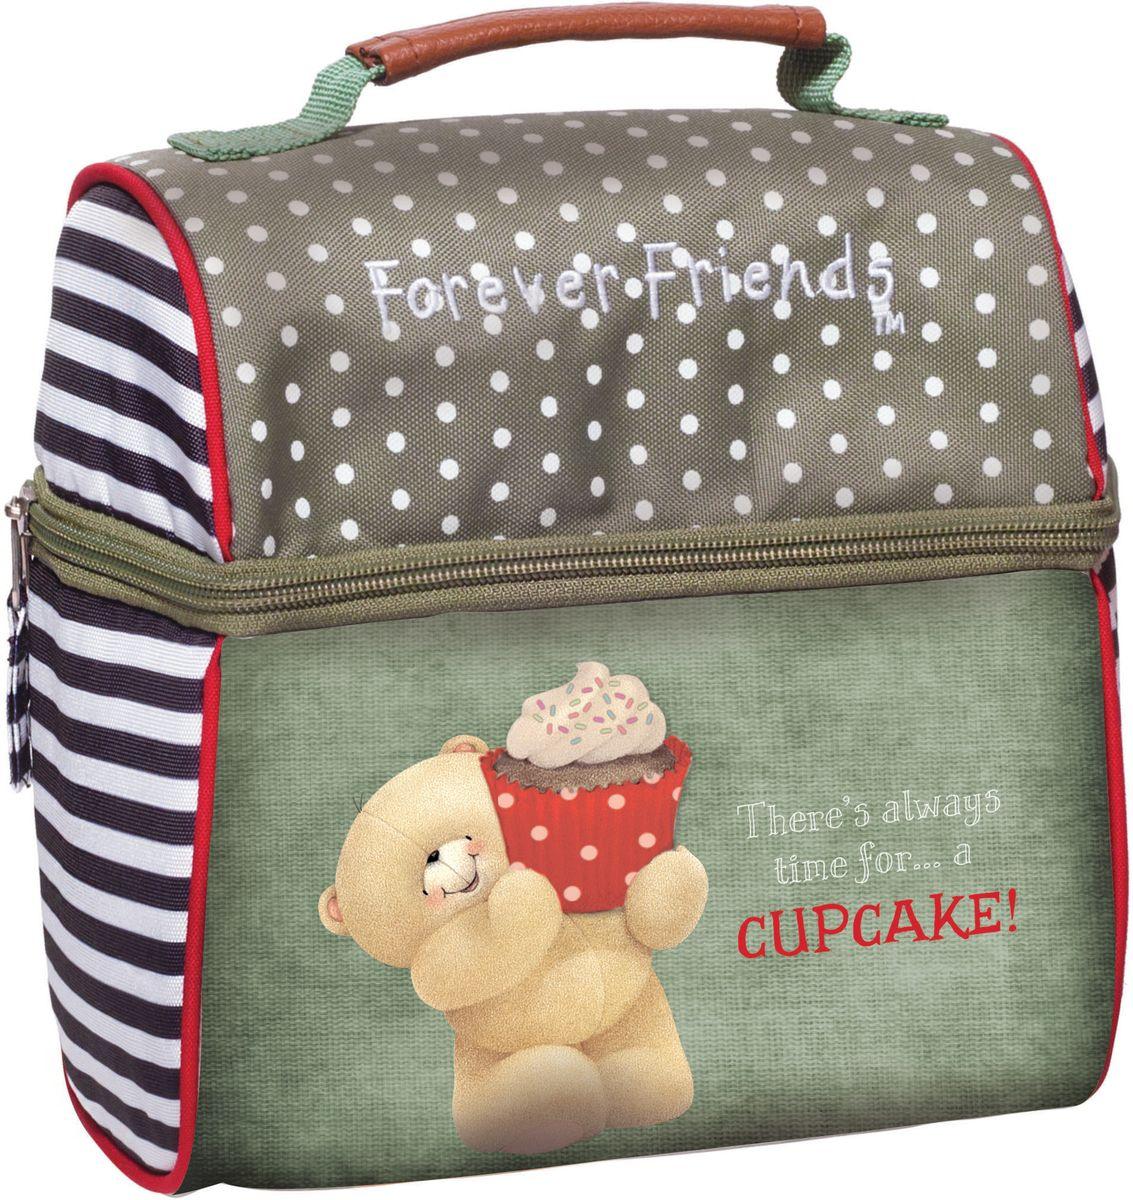 c40dee33ed Bagz Τσαντάκι Φαγητού Forever Friends Cupcake BMU 333-41221